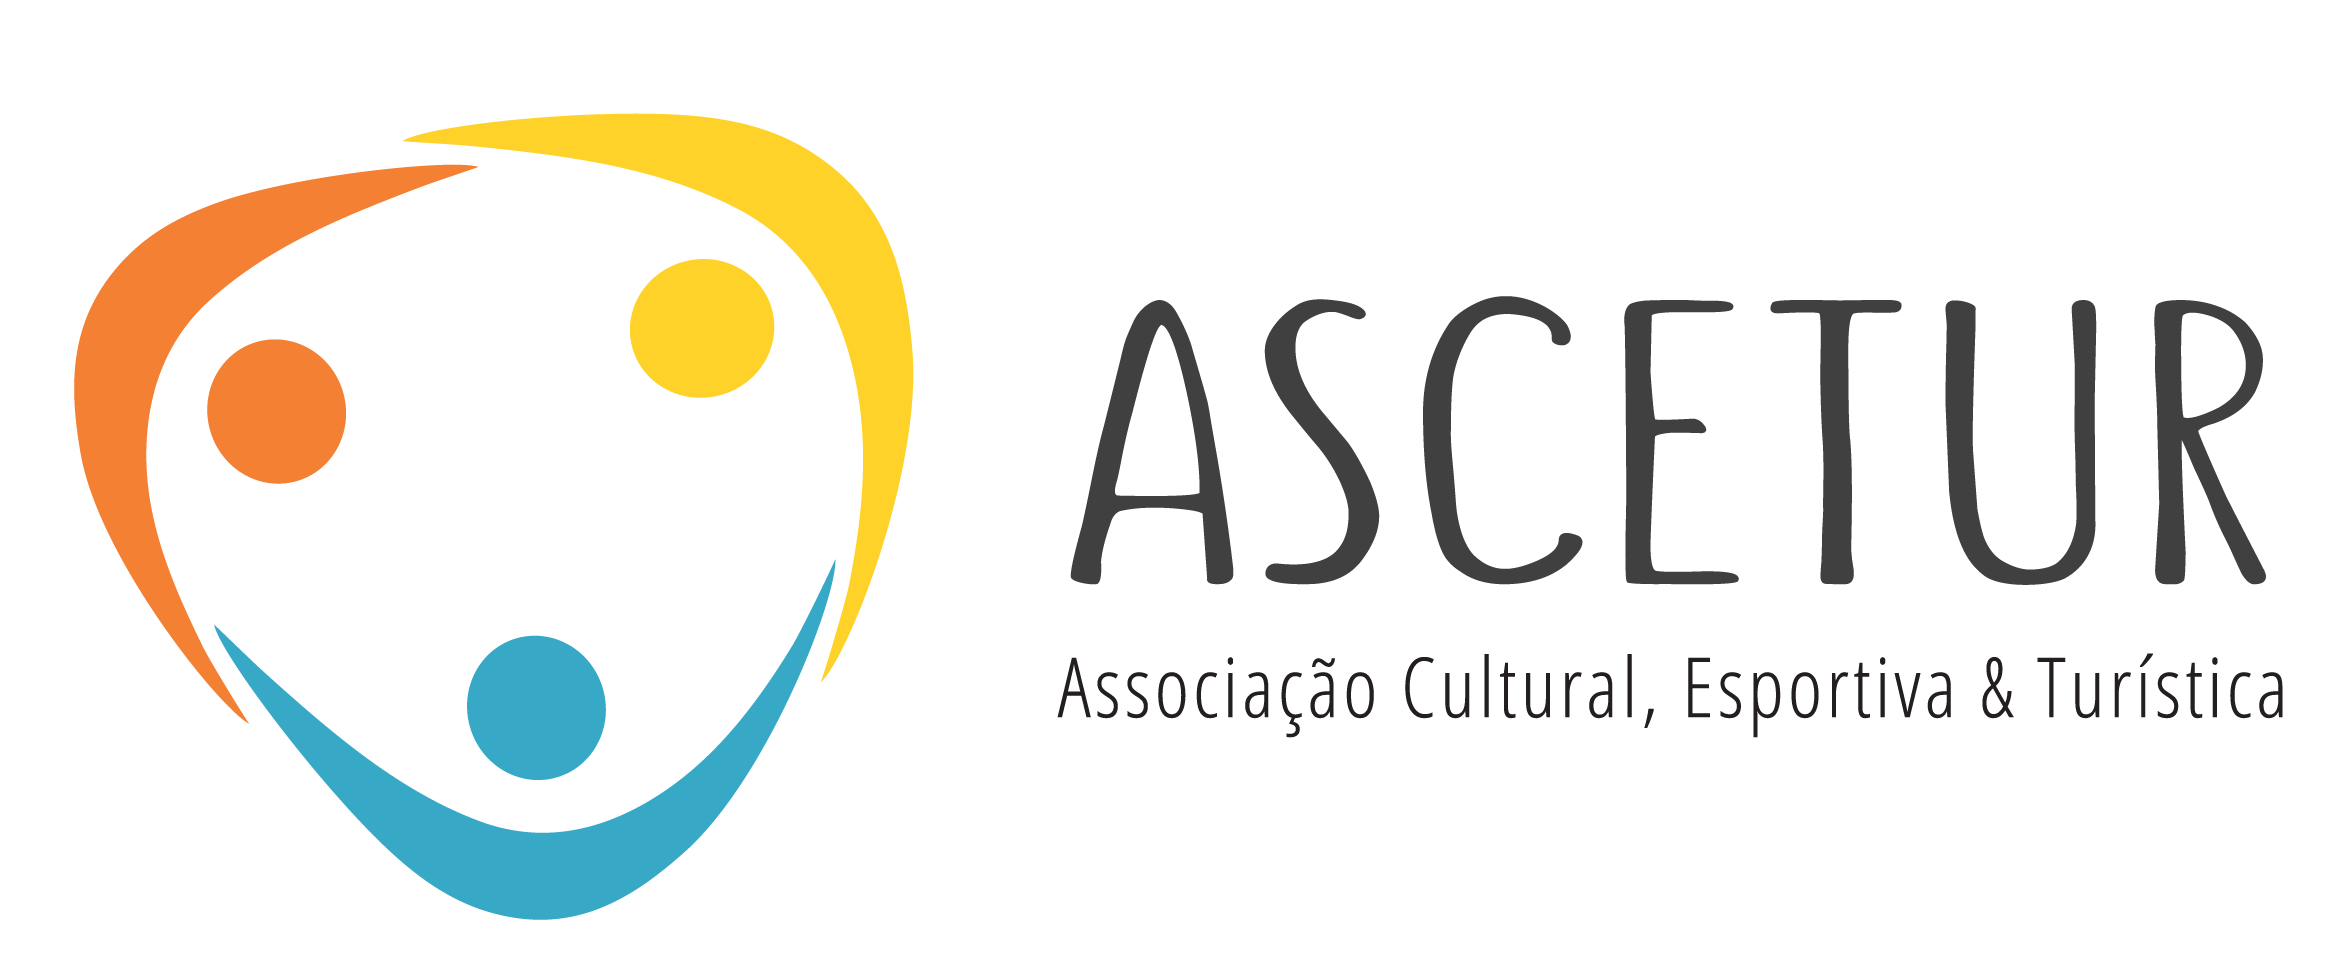 Ascetur